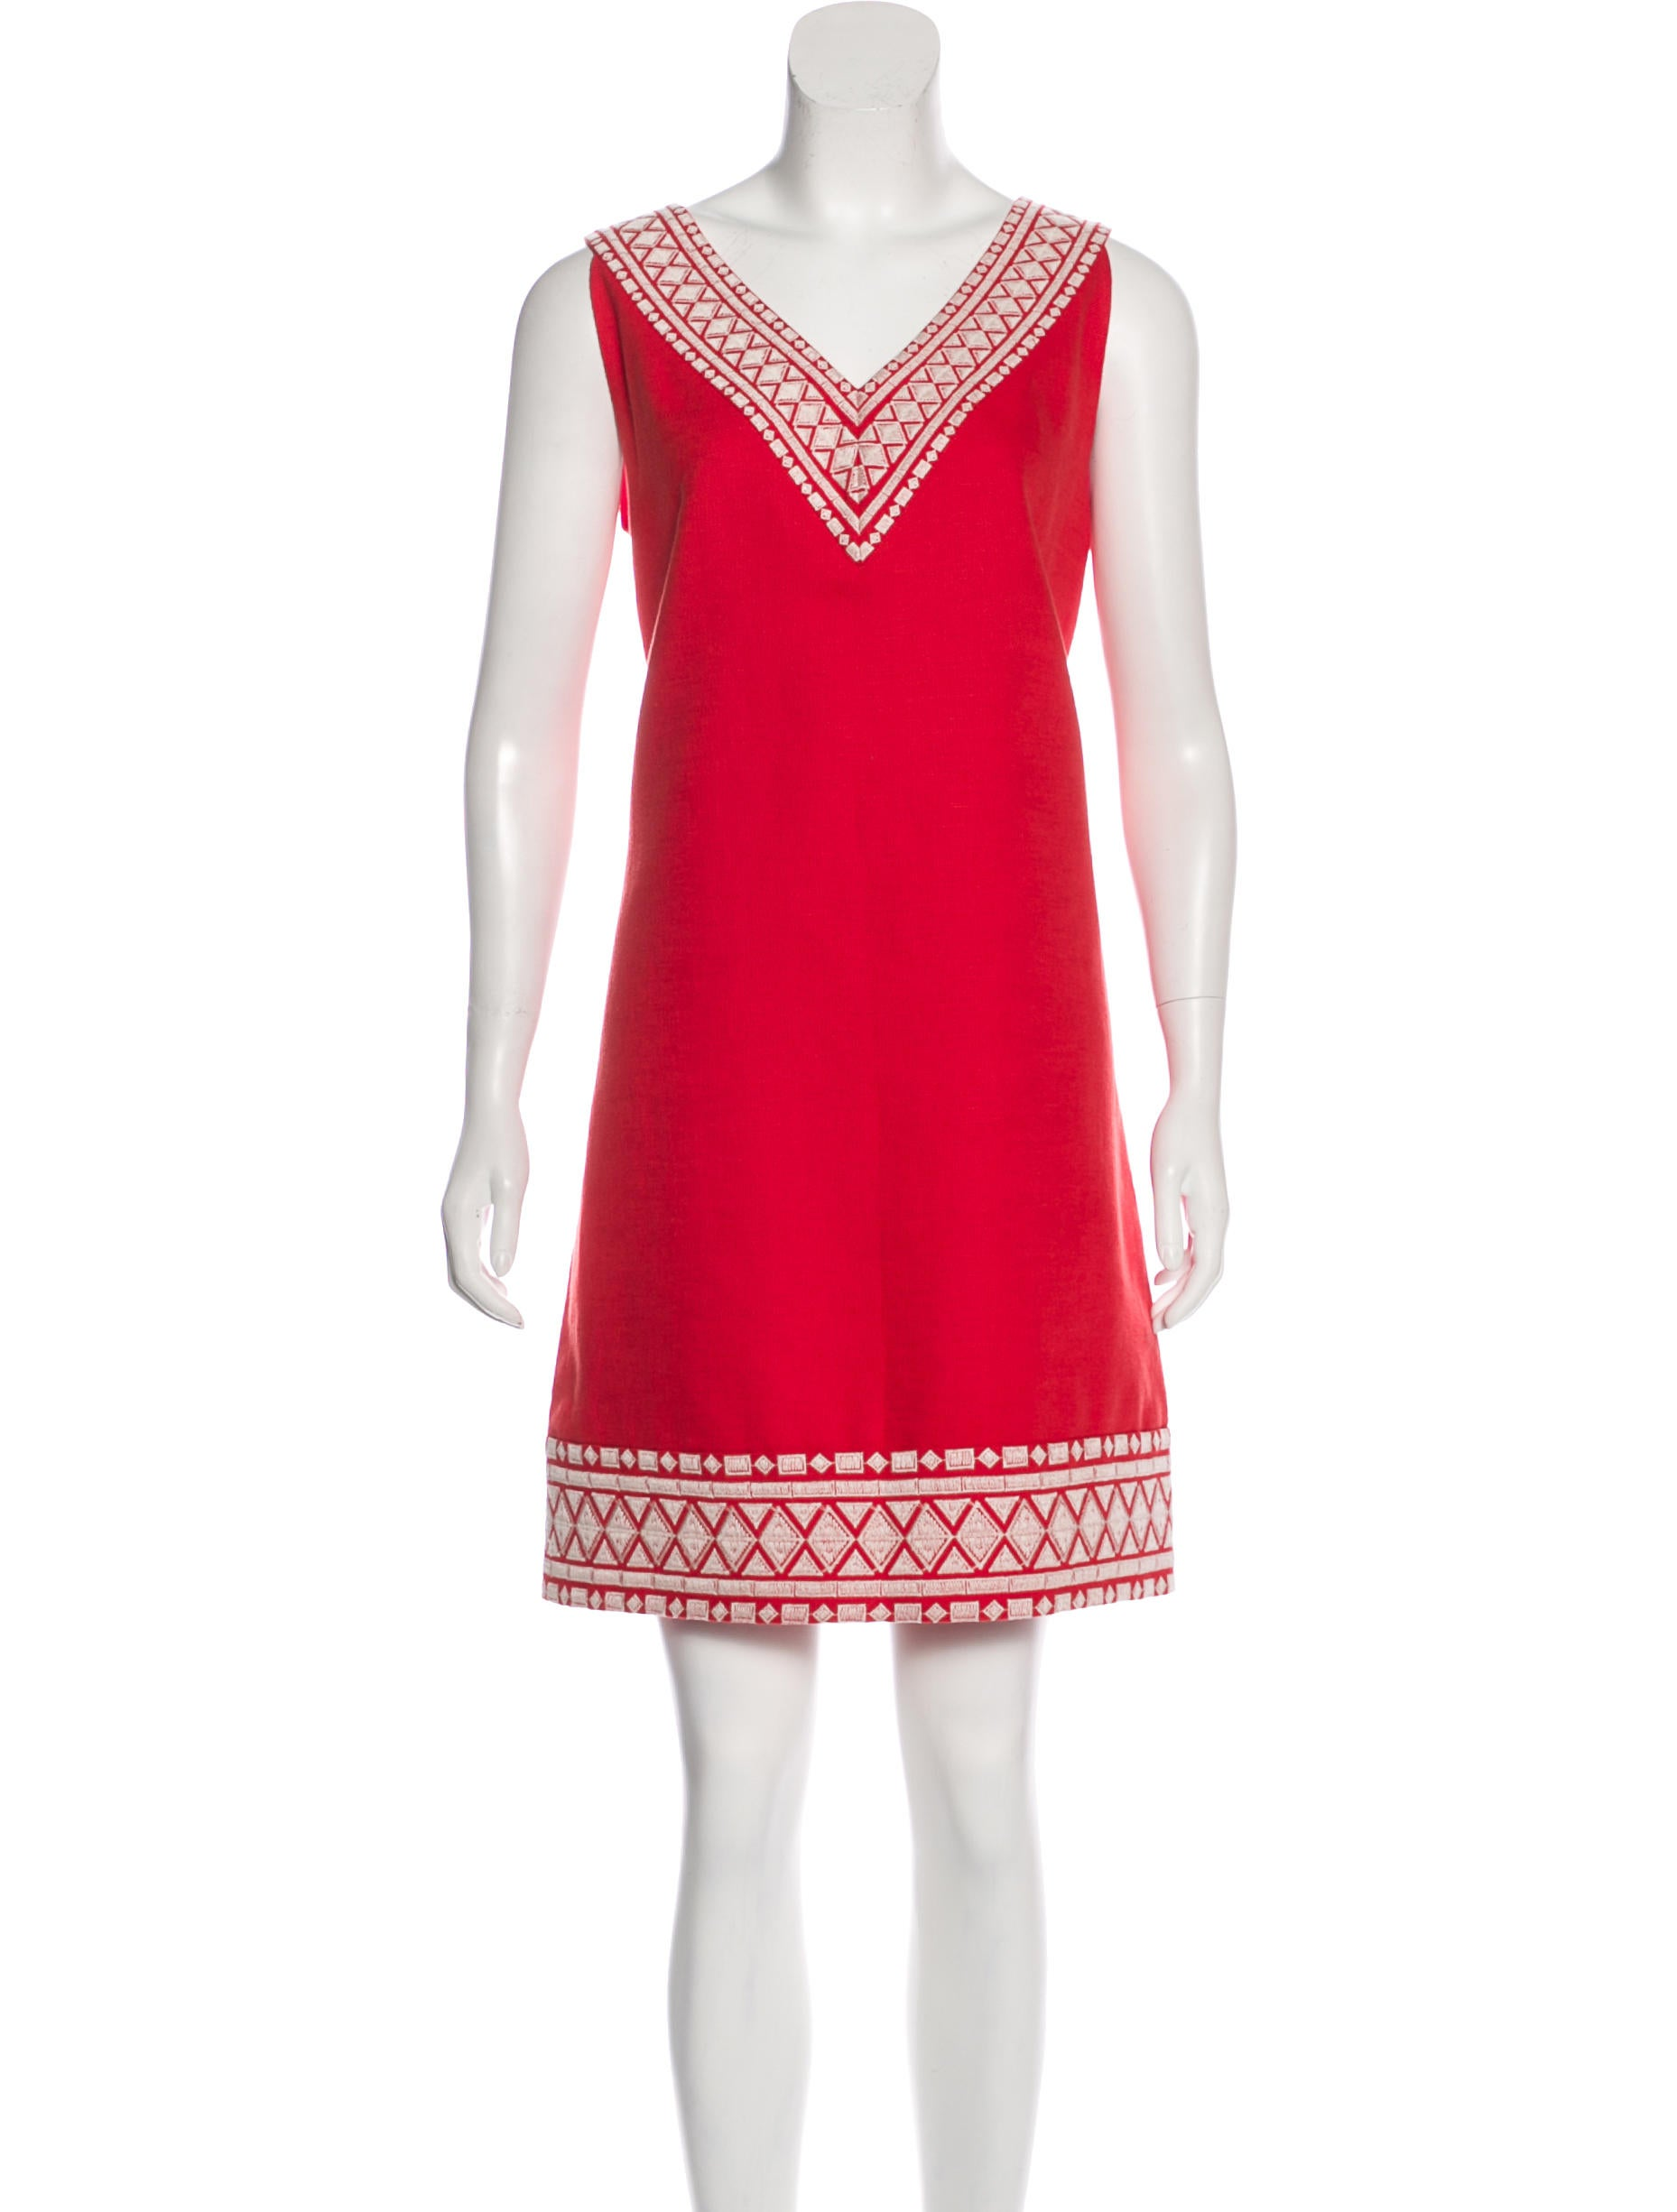 Kate spade new york linen blend embroidered dress